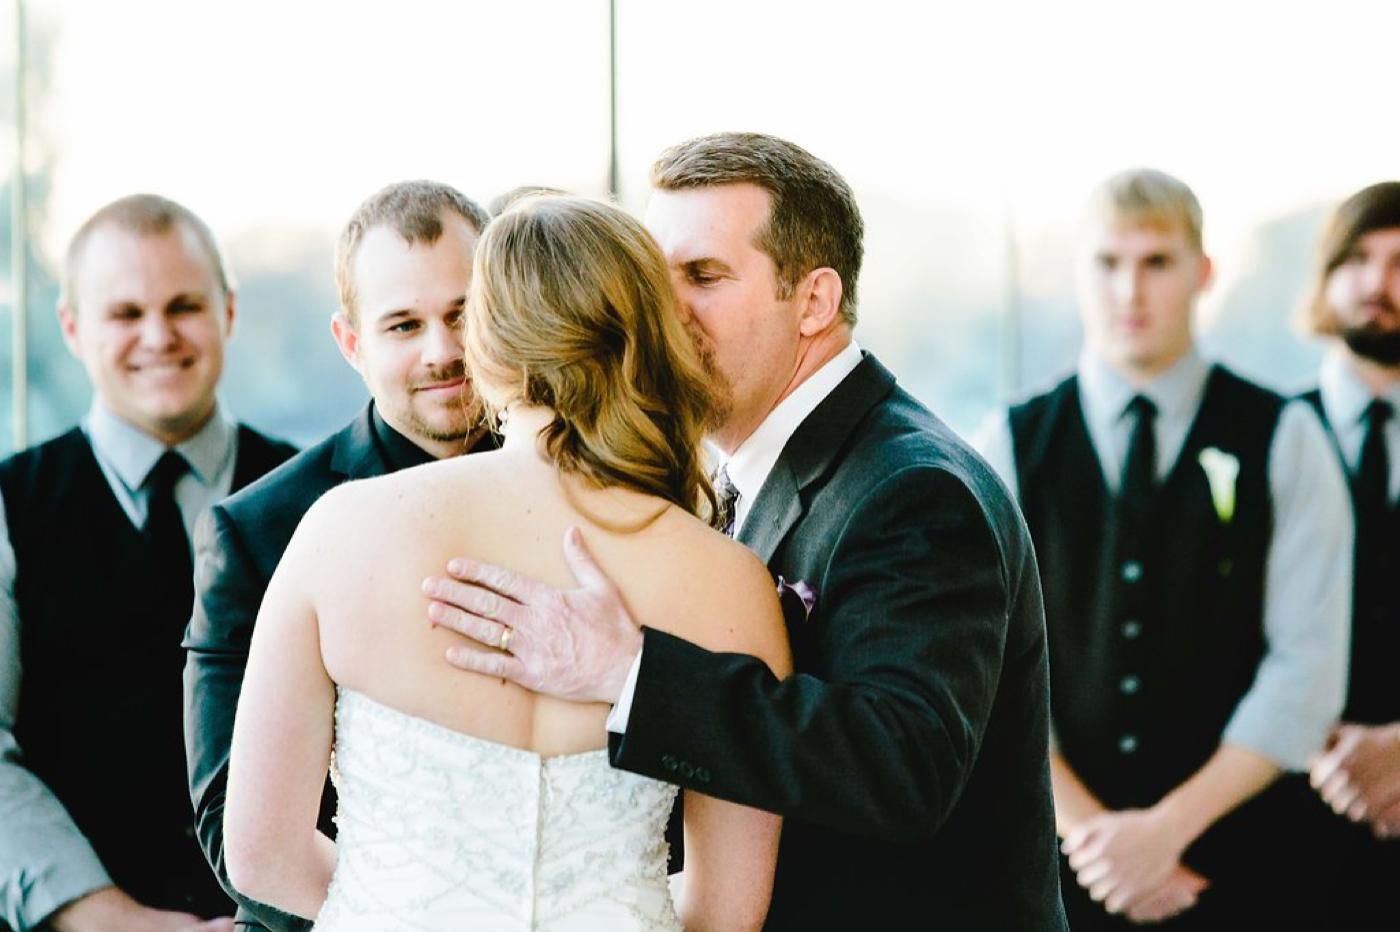 chicago-fine-art-wedding-photography-burnette17